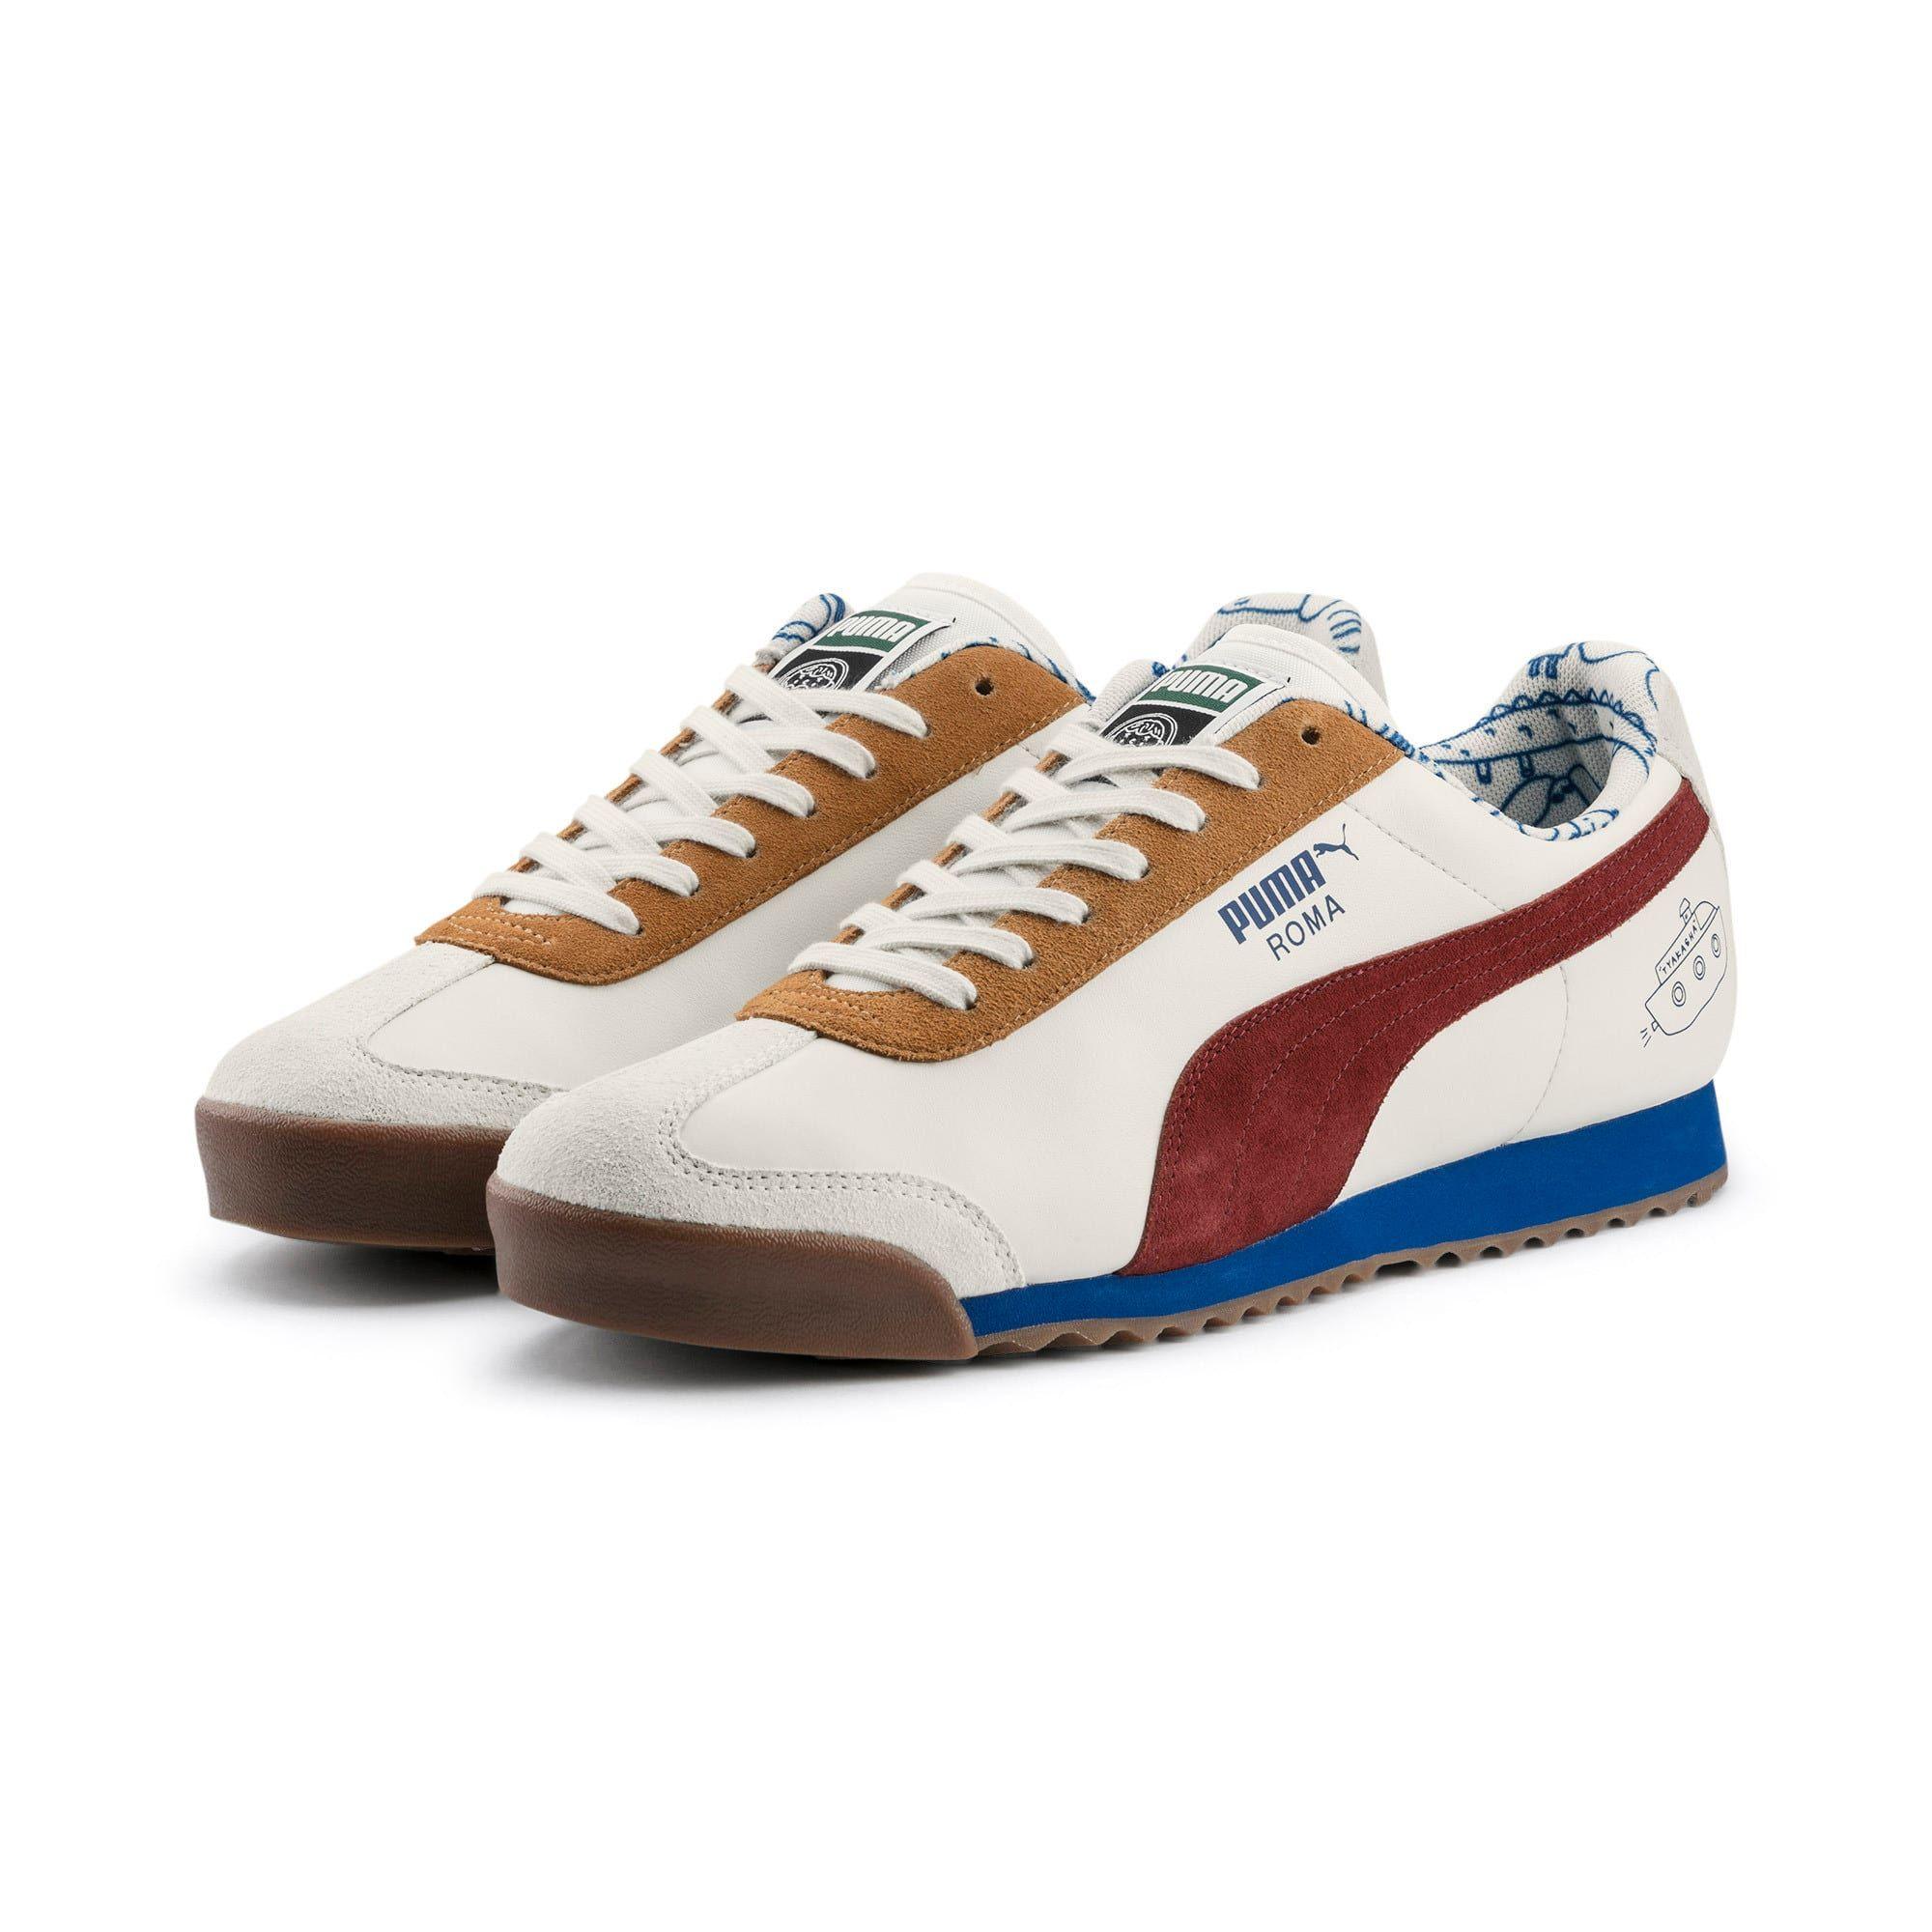 Chaussure PUMA x TYAKASHA Roma | Sneakers, Leather sneakers